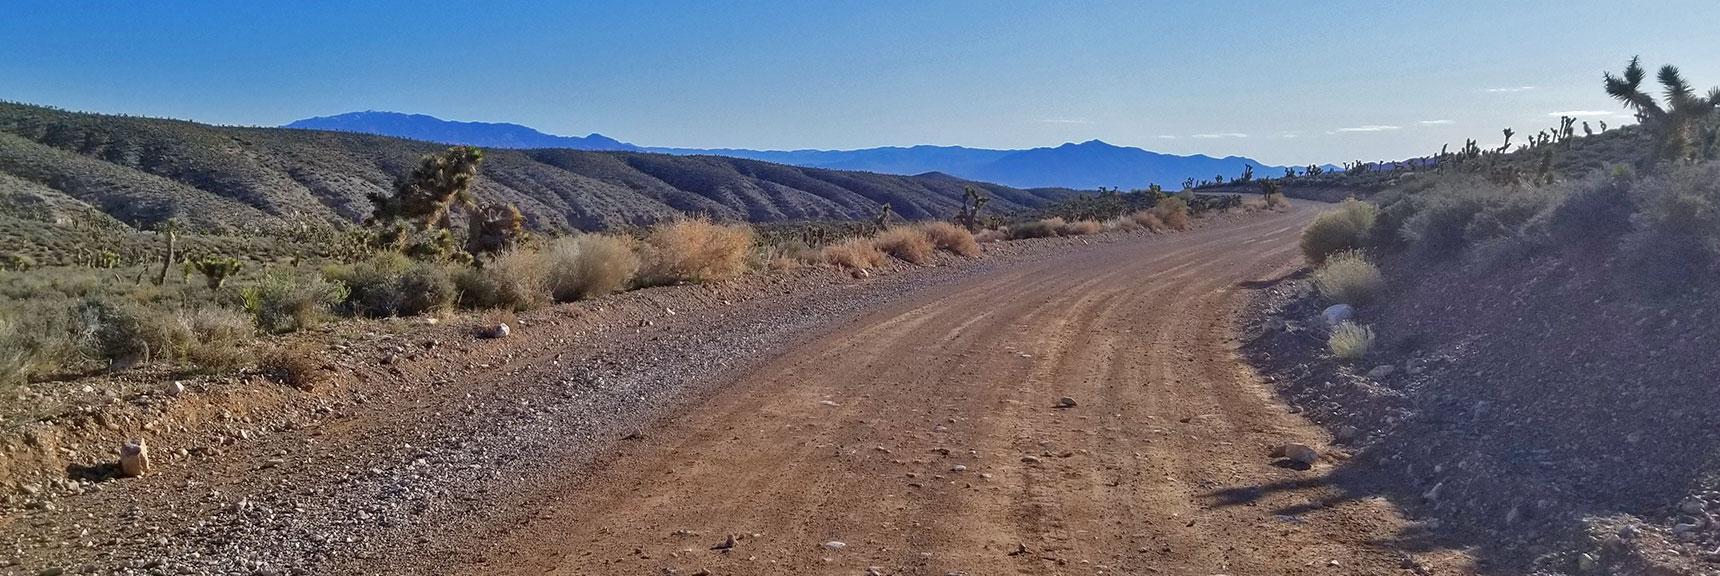 Lower Harris Springs Road Heading Toward La Madre Mountain 4wd Road, Nevada